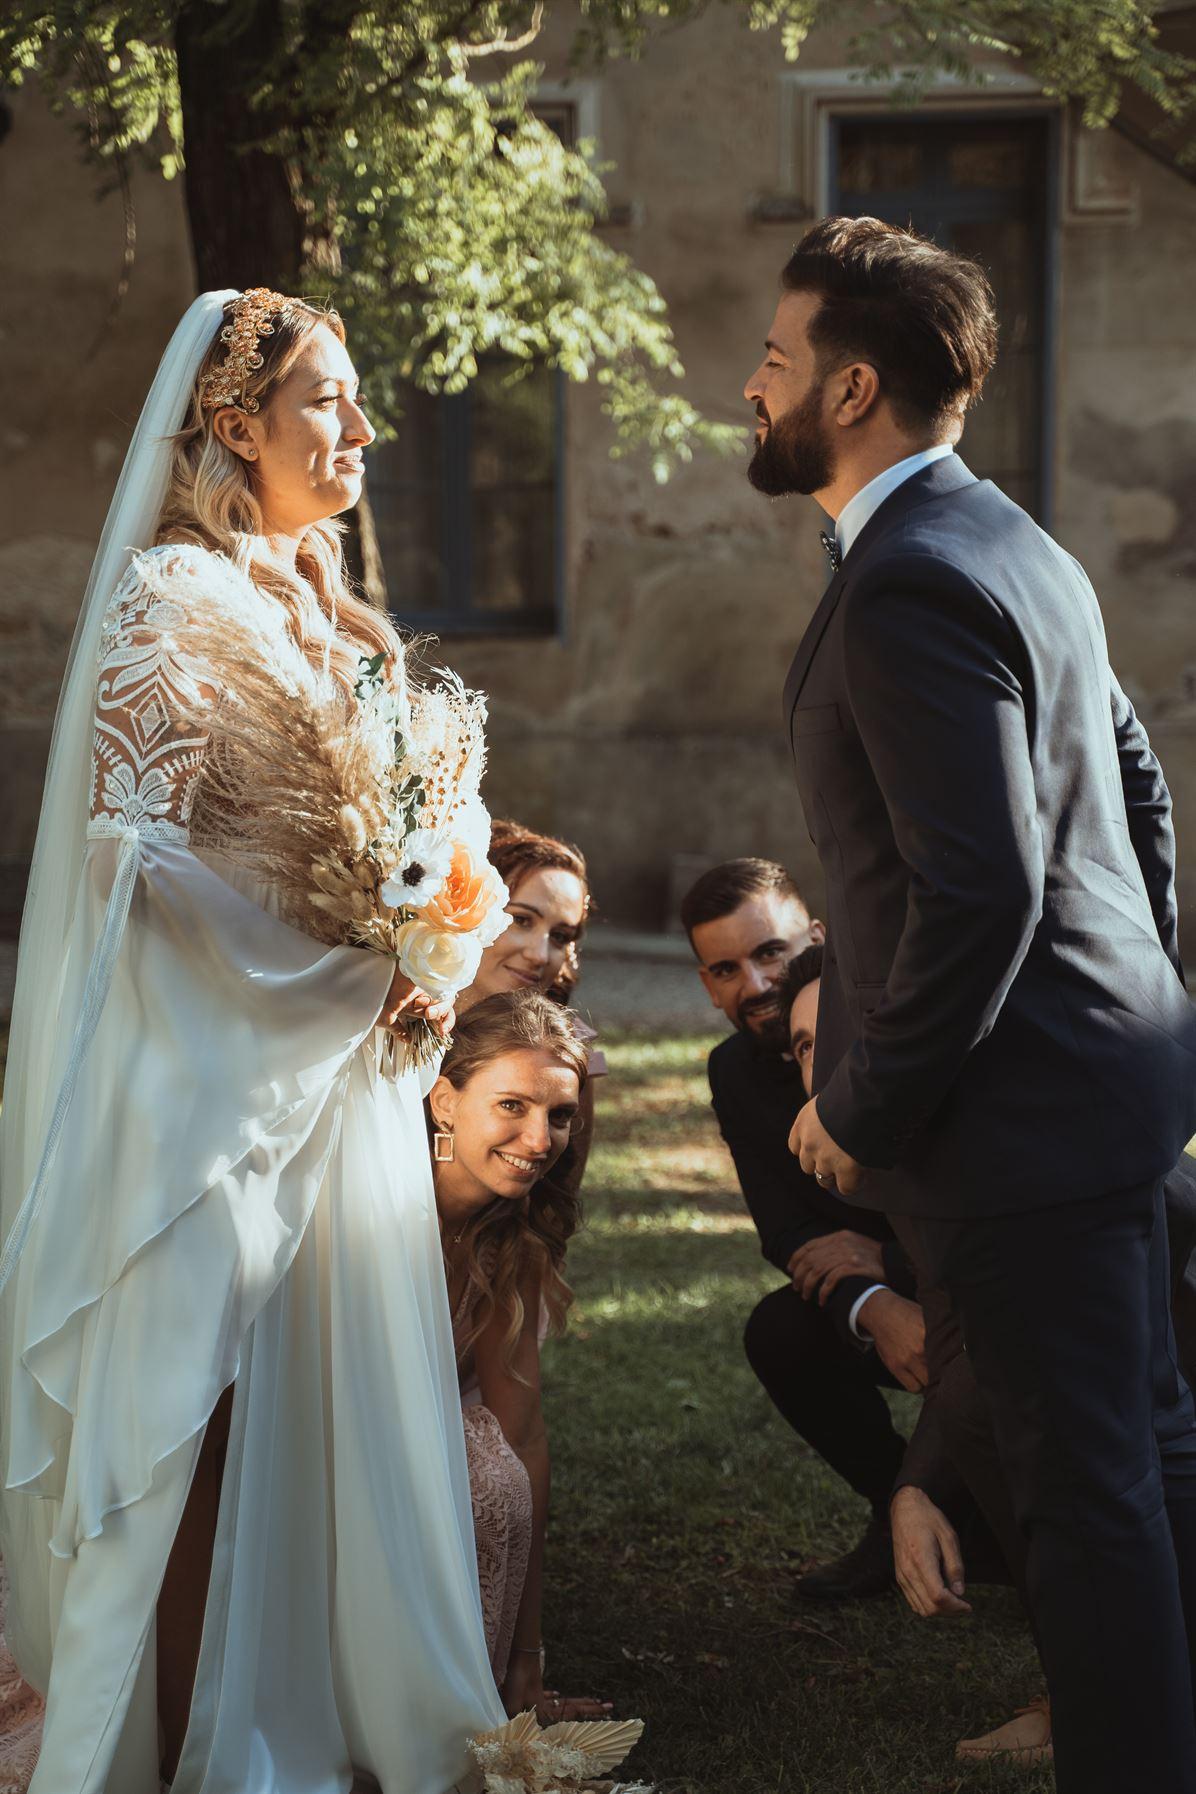 Mariage Claire & Walid : La cérémonie 71